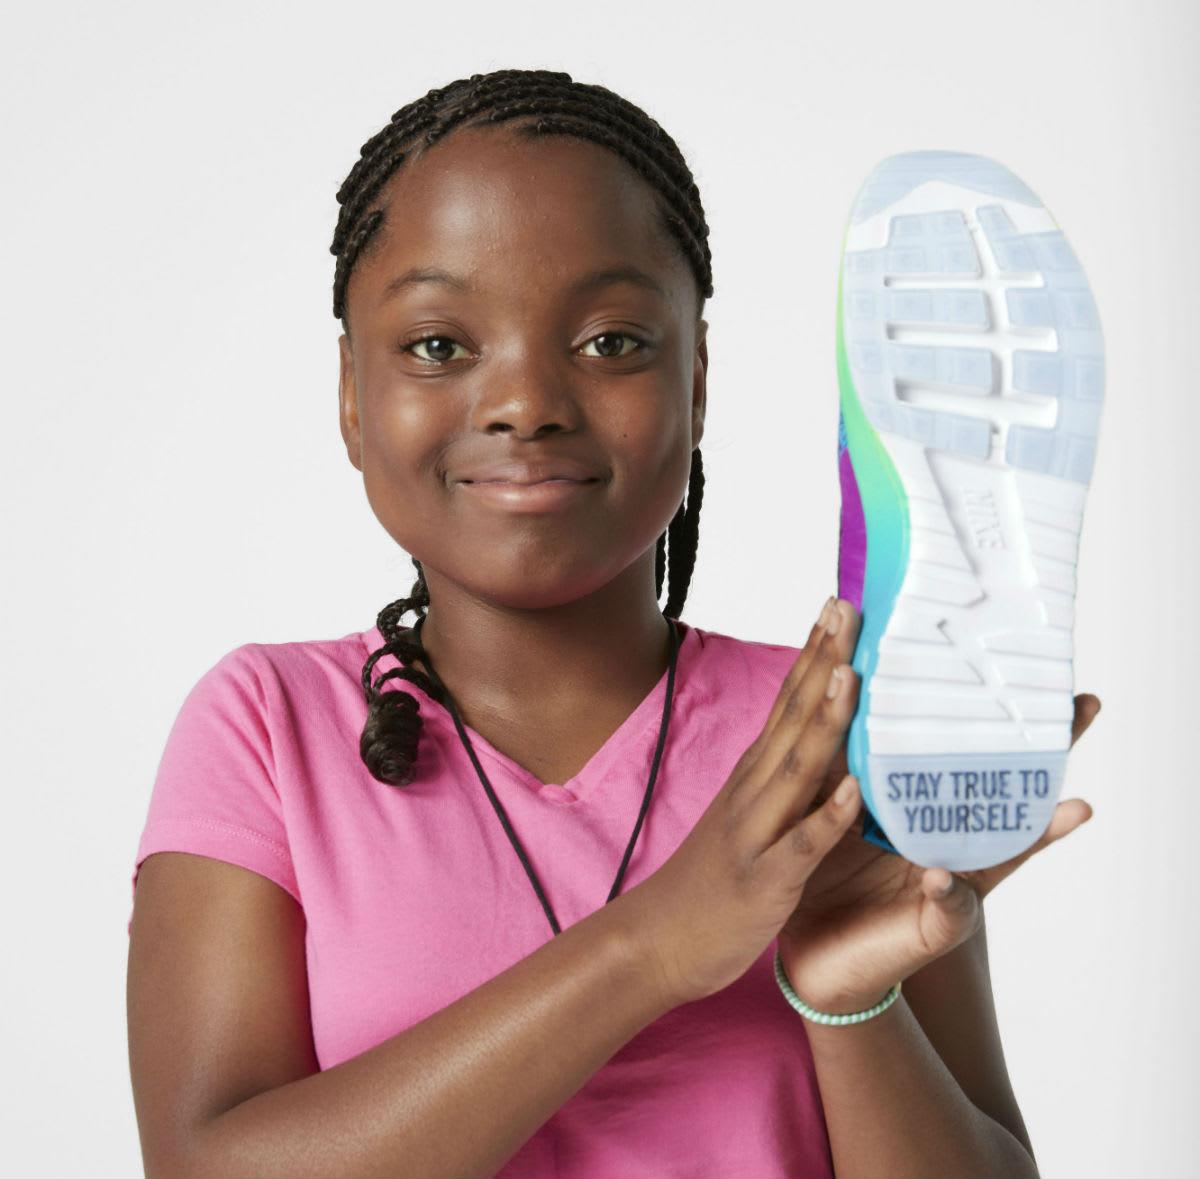 Nike Air Max Thea Ultra Flyknit Doernbecher Amyiah Robinson Release Portrait